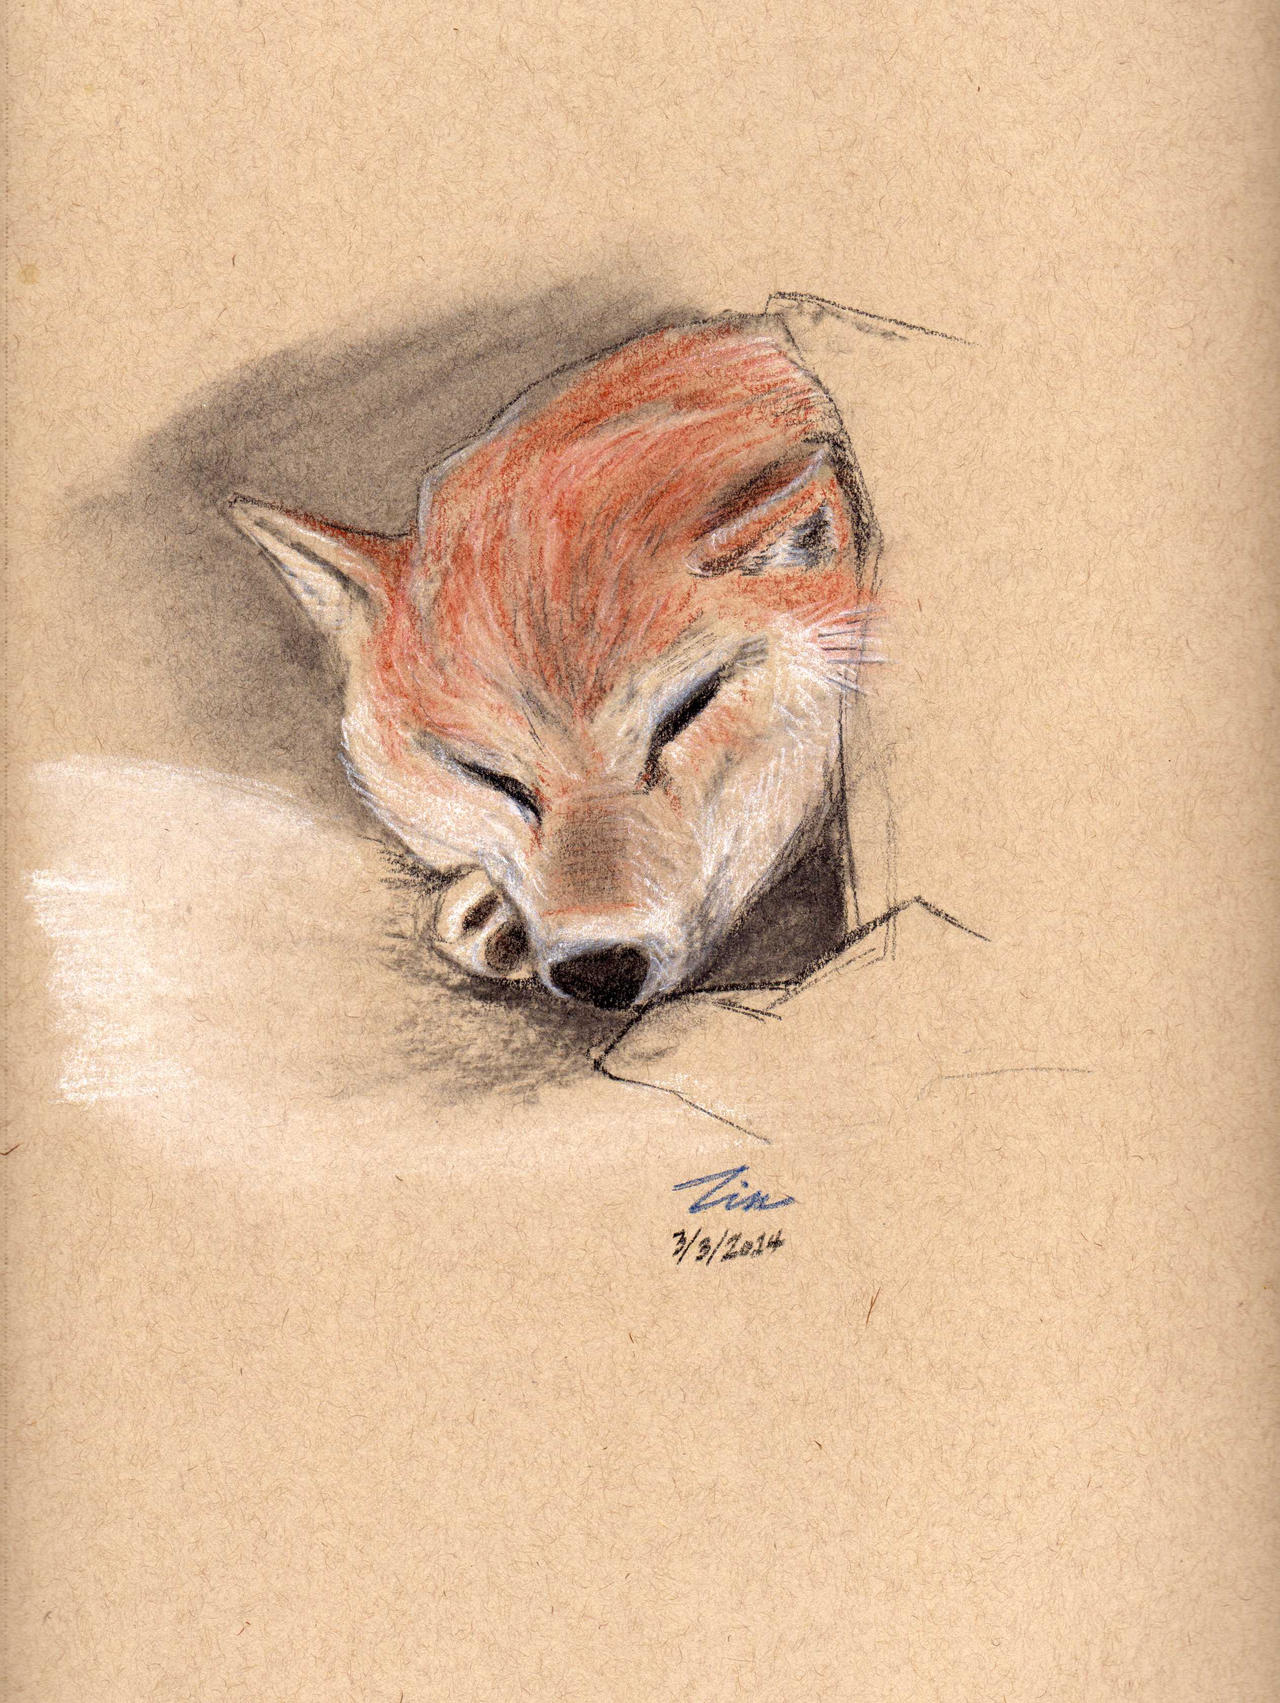 Shiba Inu Study by Ranfield